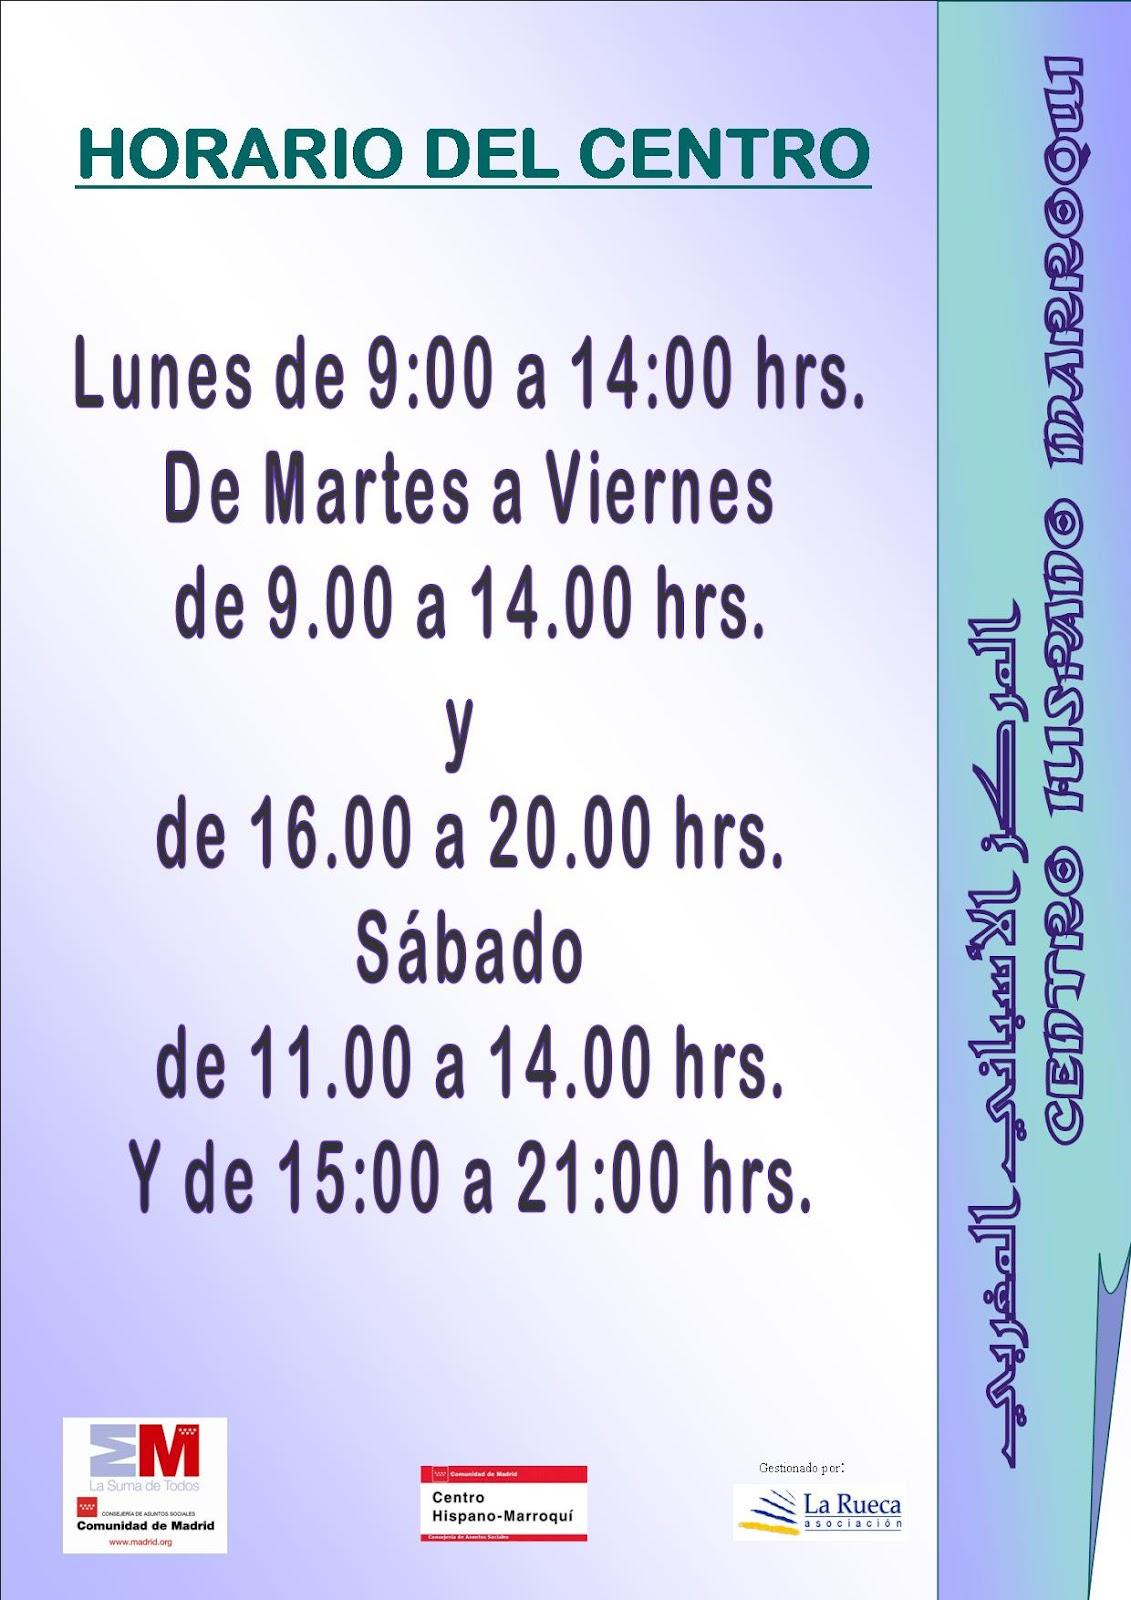 Centro hispano marroqu horario de atenci n for Horario oficinas bankinter madrid